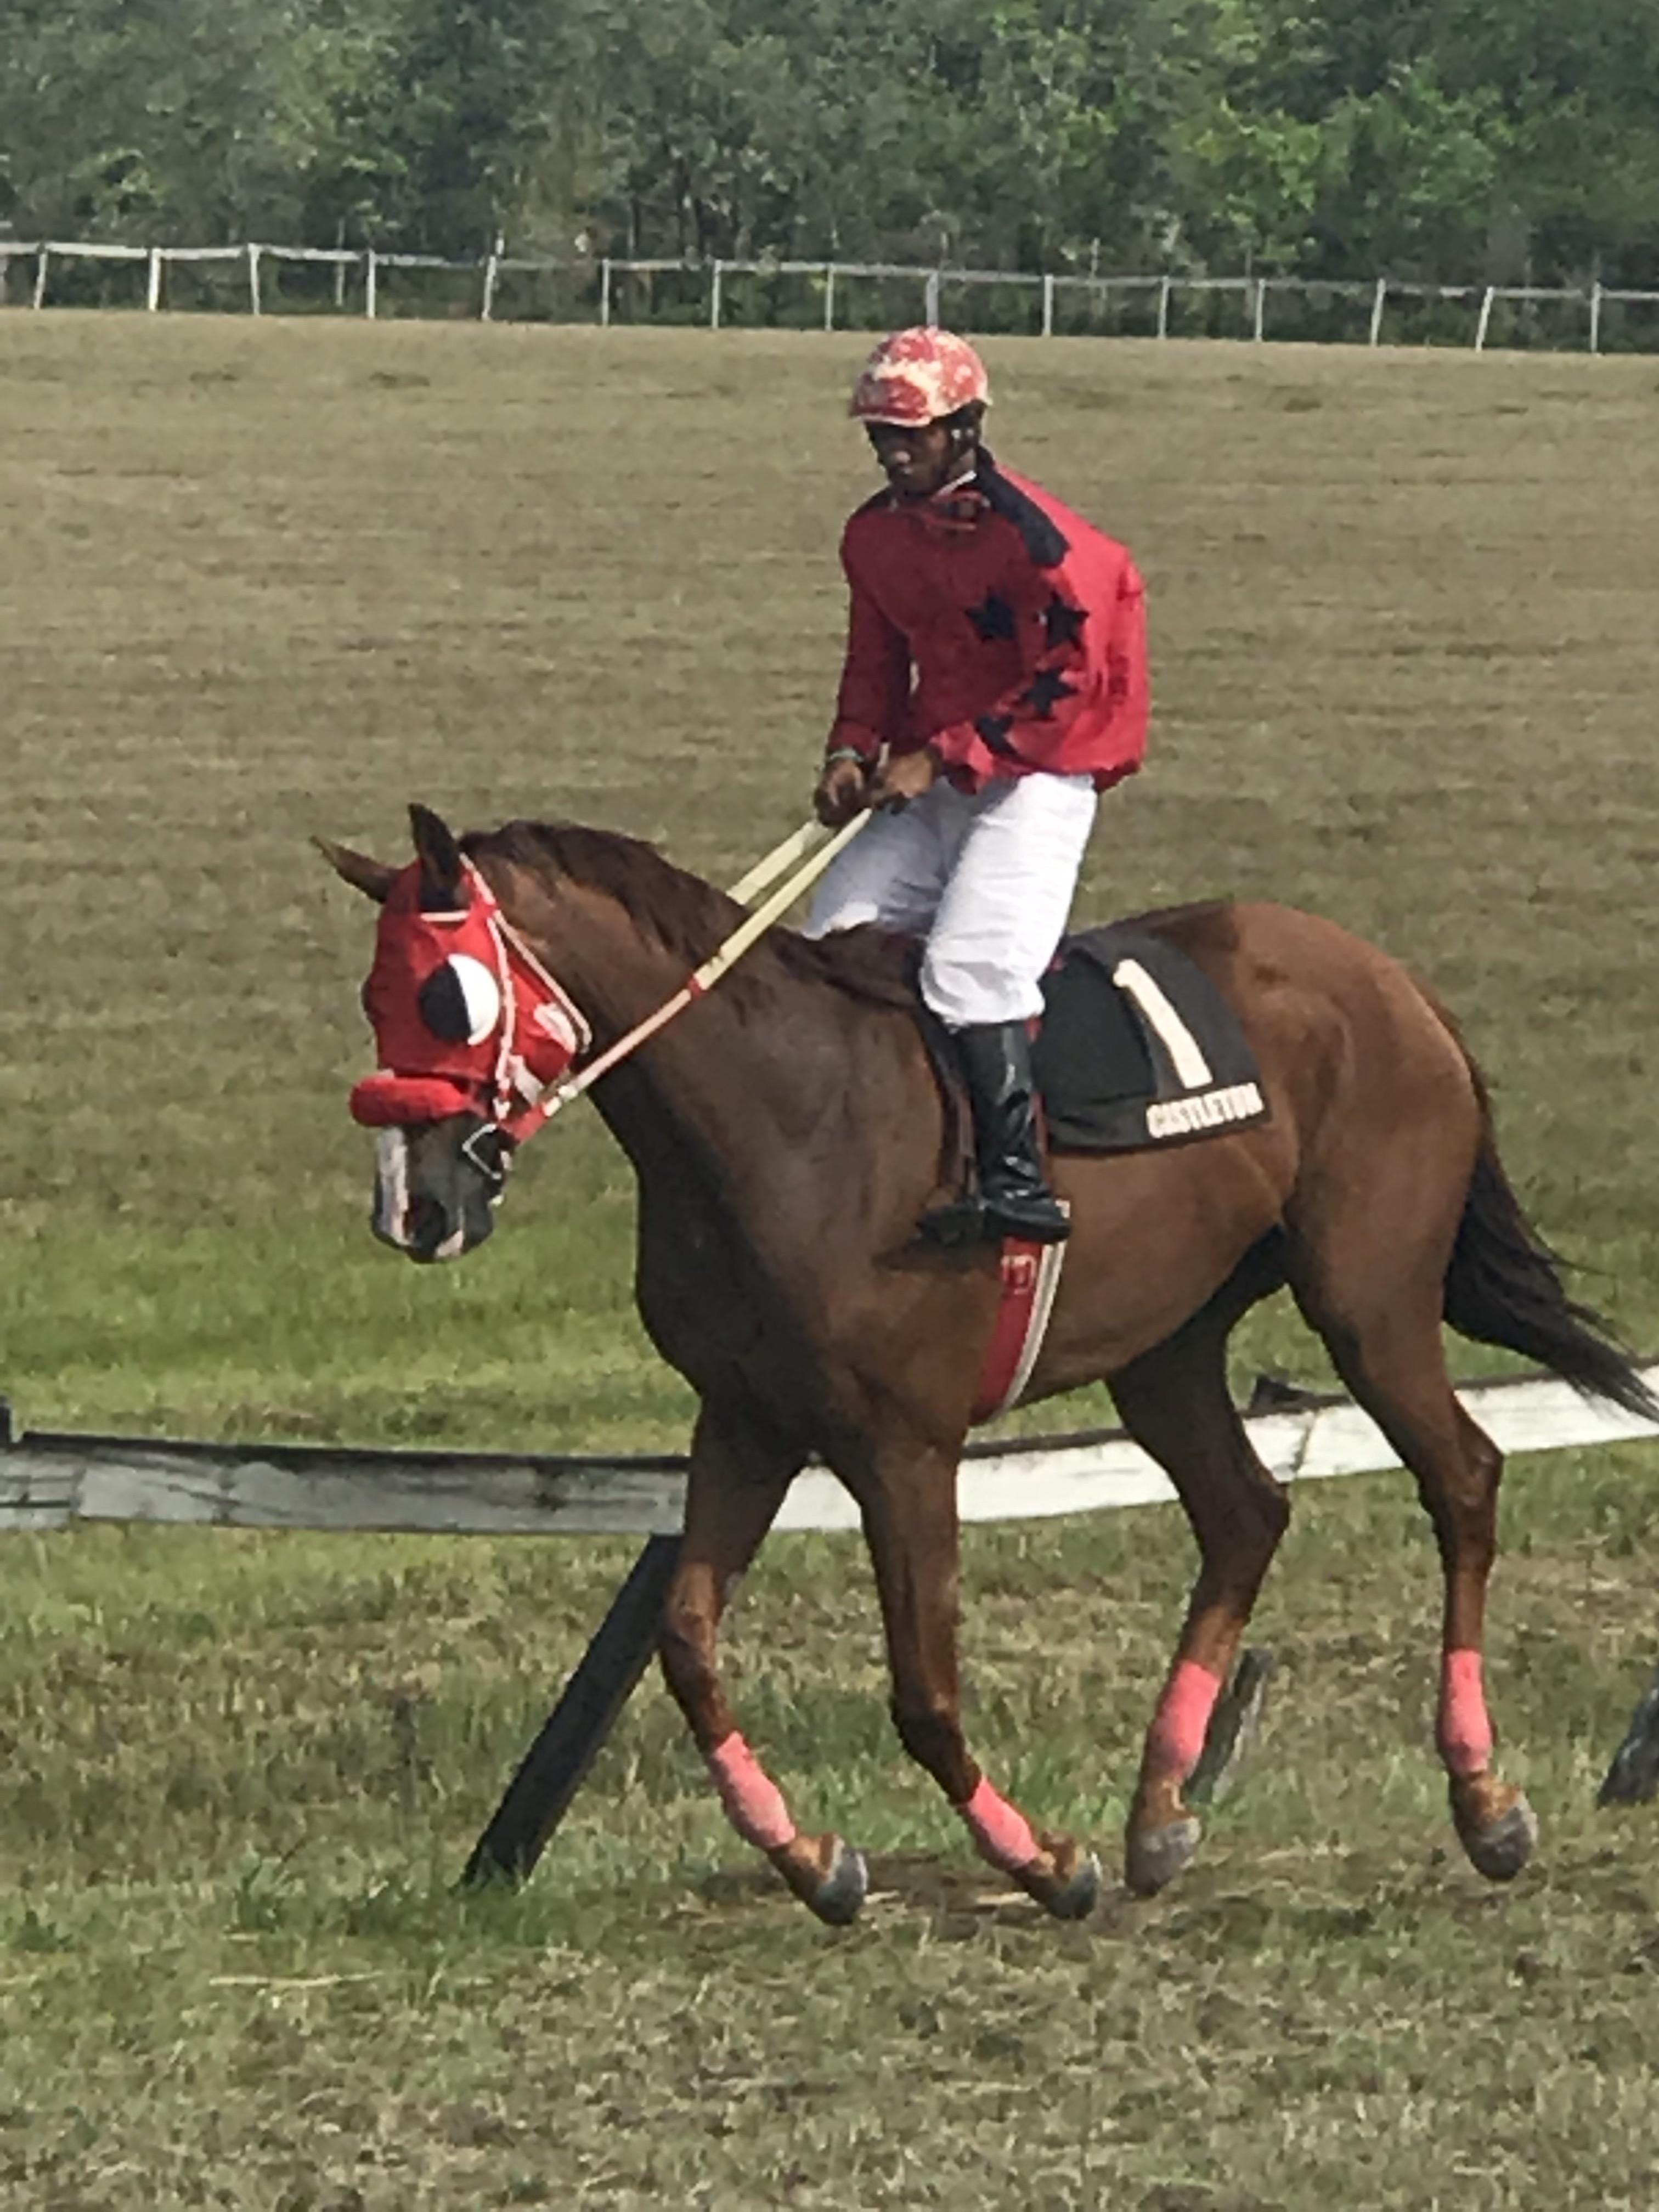 https://horseracingbelize.com/Brittany's Special